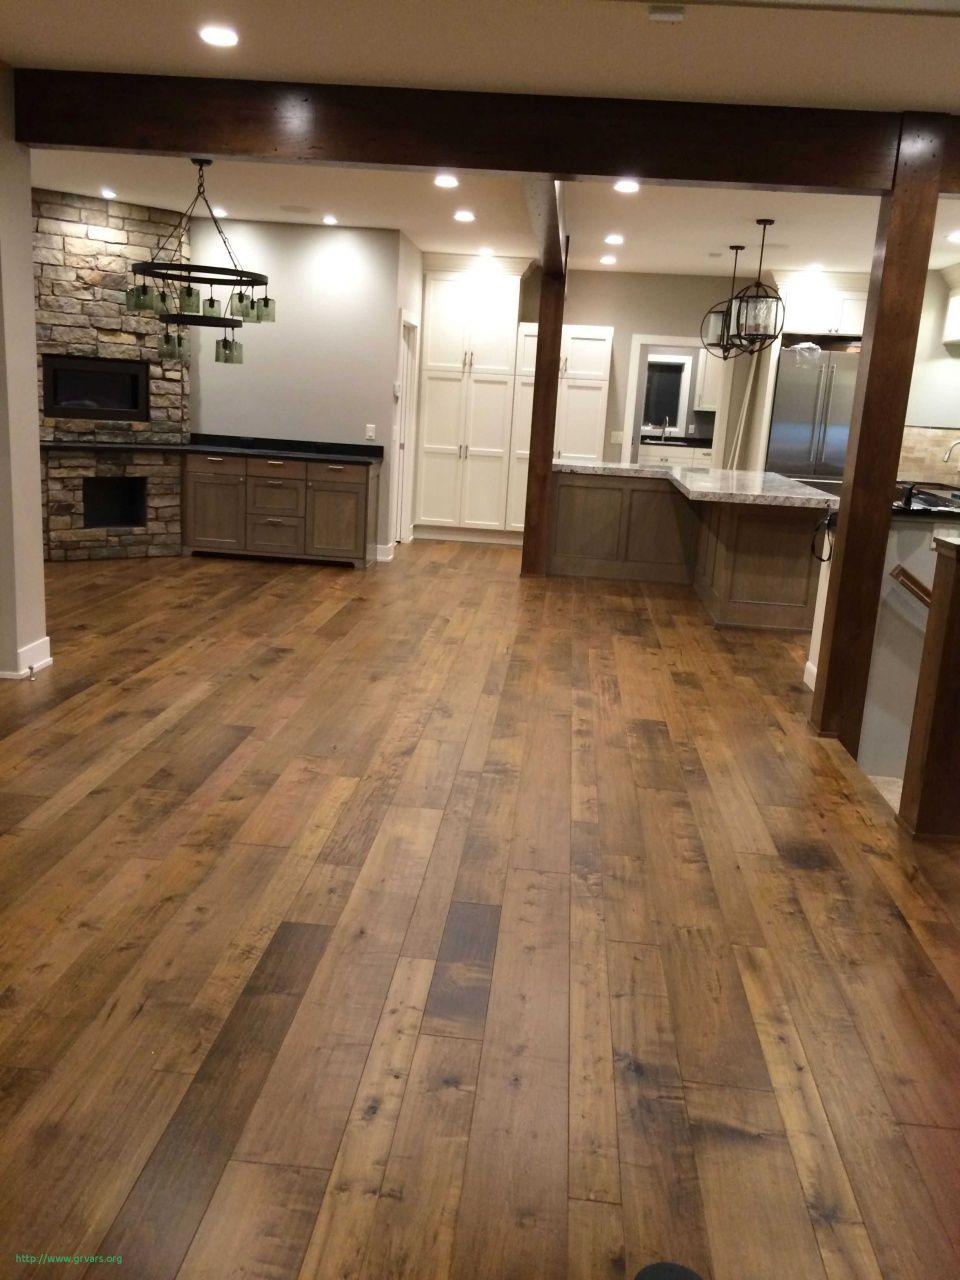 Floor and Decor Plano Tx Hours in 5  Engineered wood floors